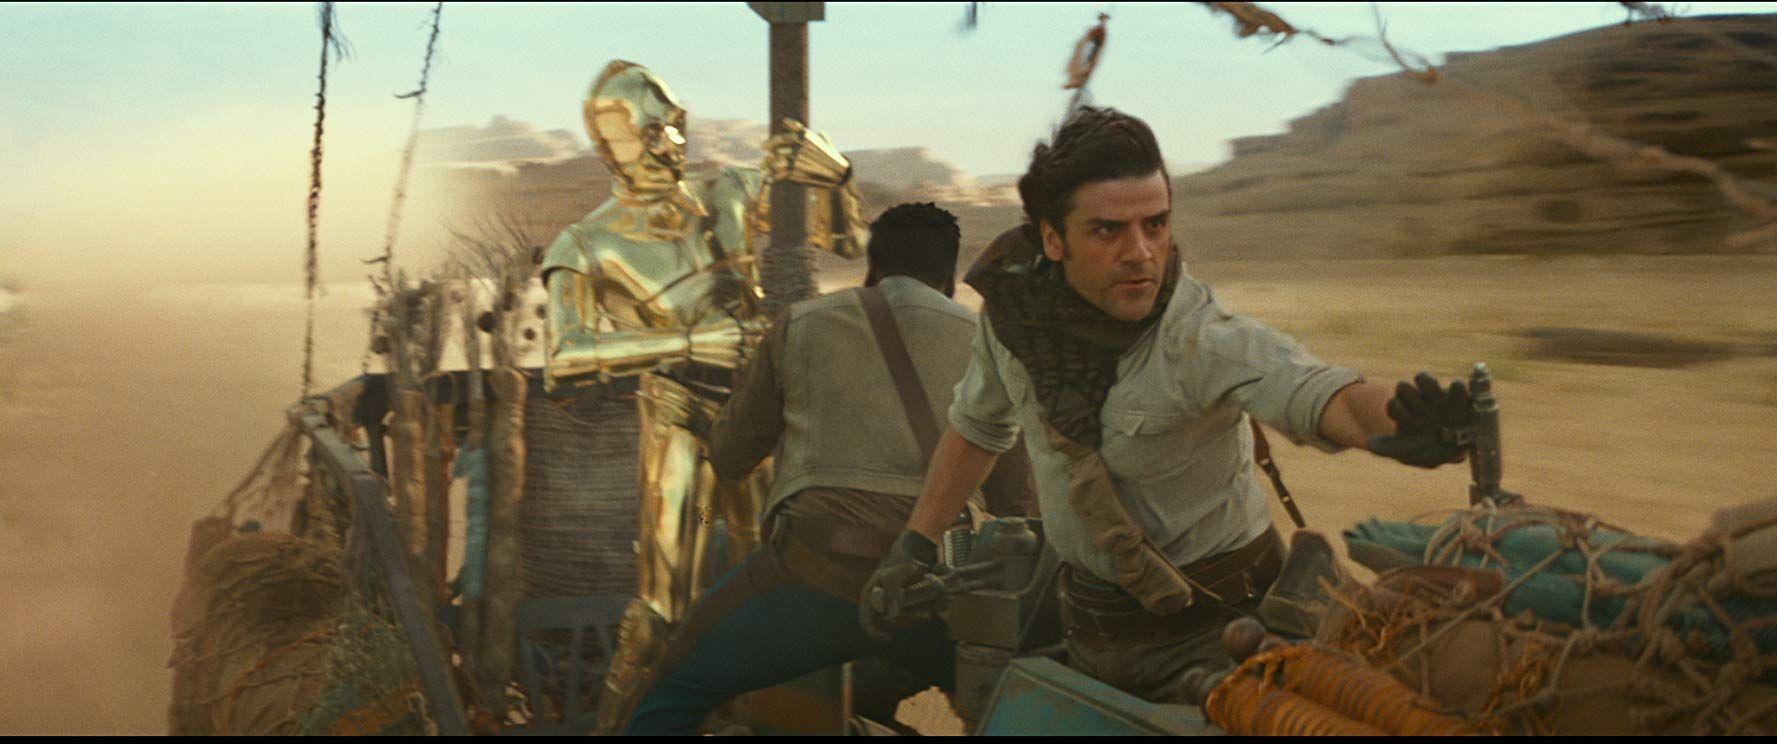 Imagen 12 de Star Wars: El Ascenso de Skywalker